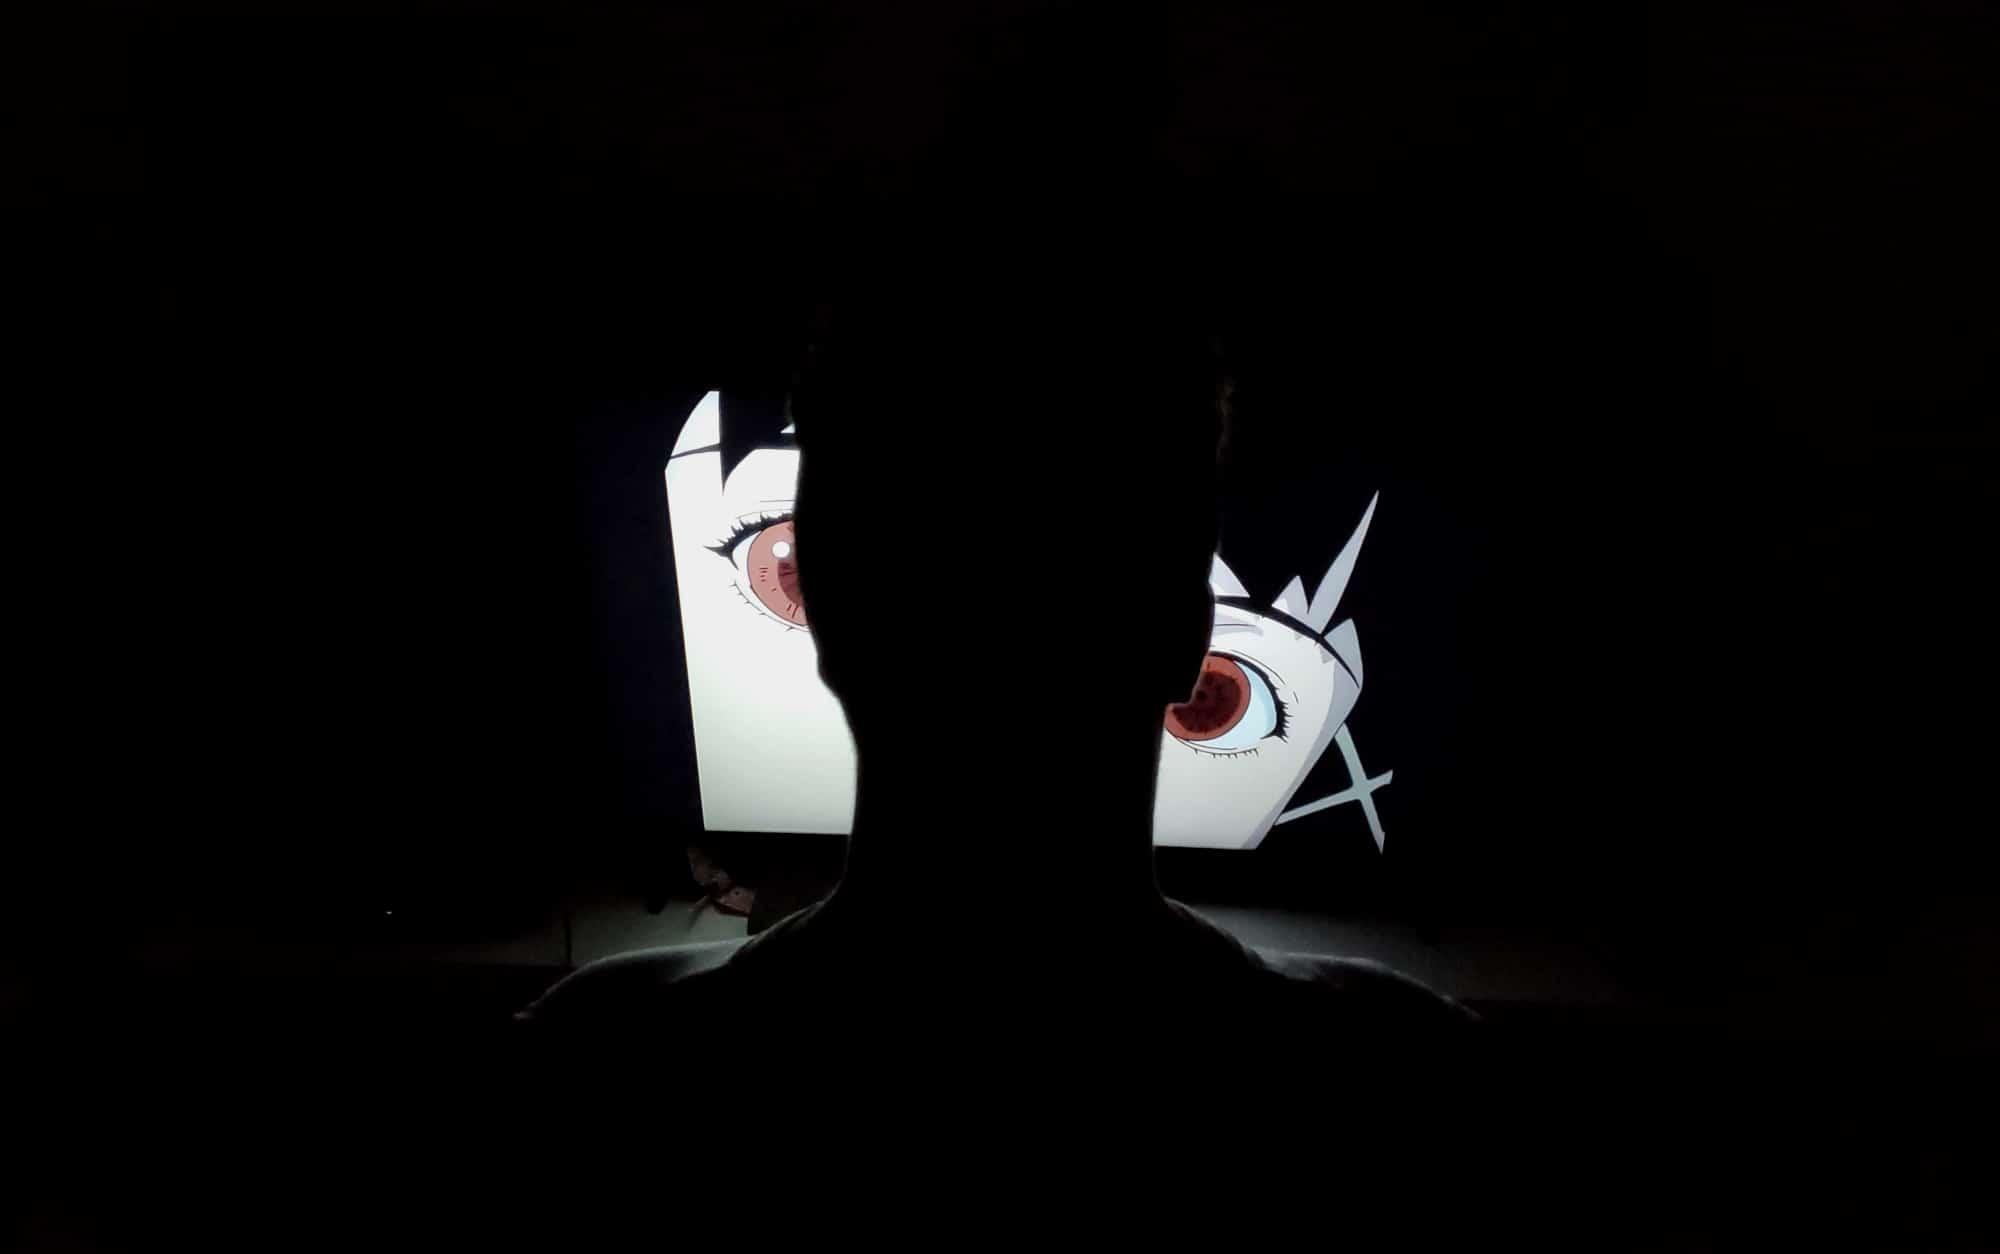 I rewatch stuff in the dark